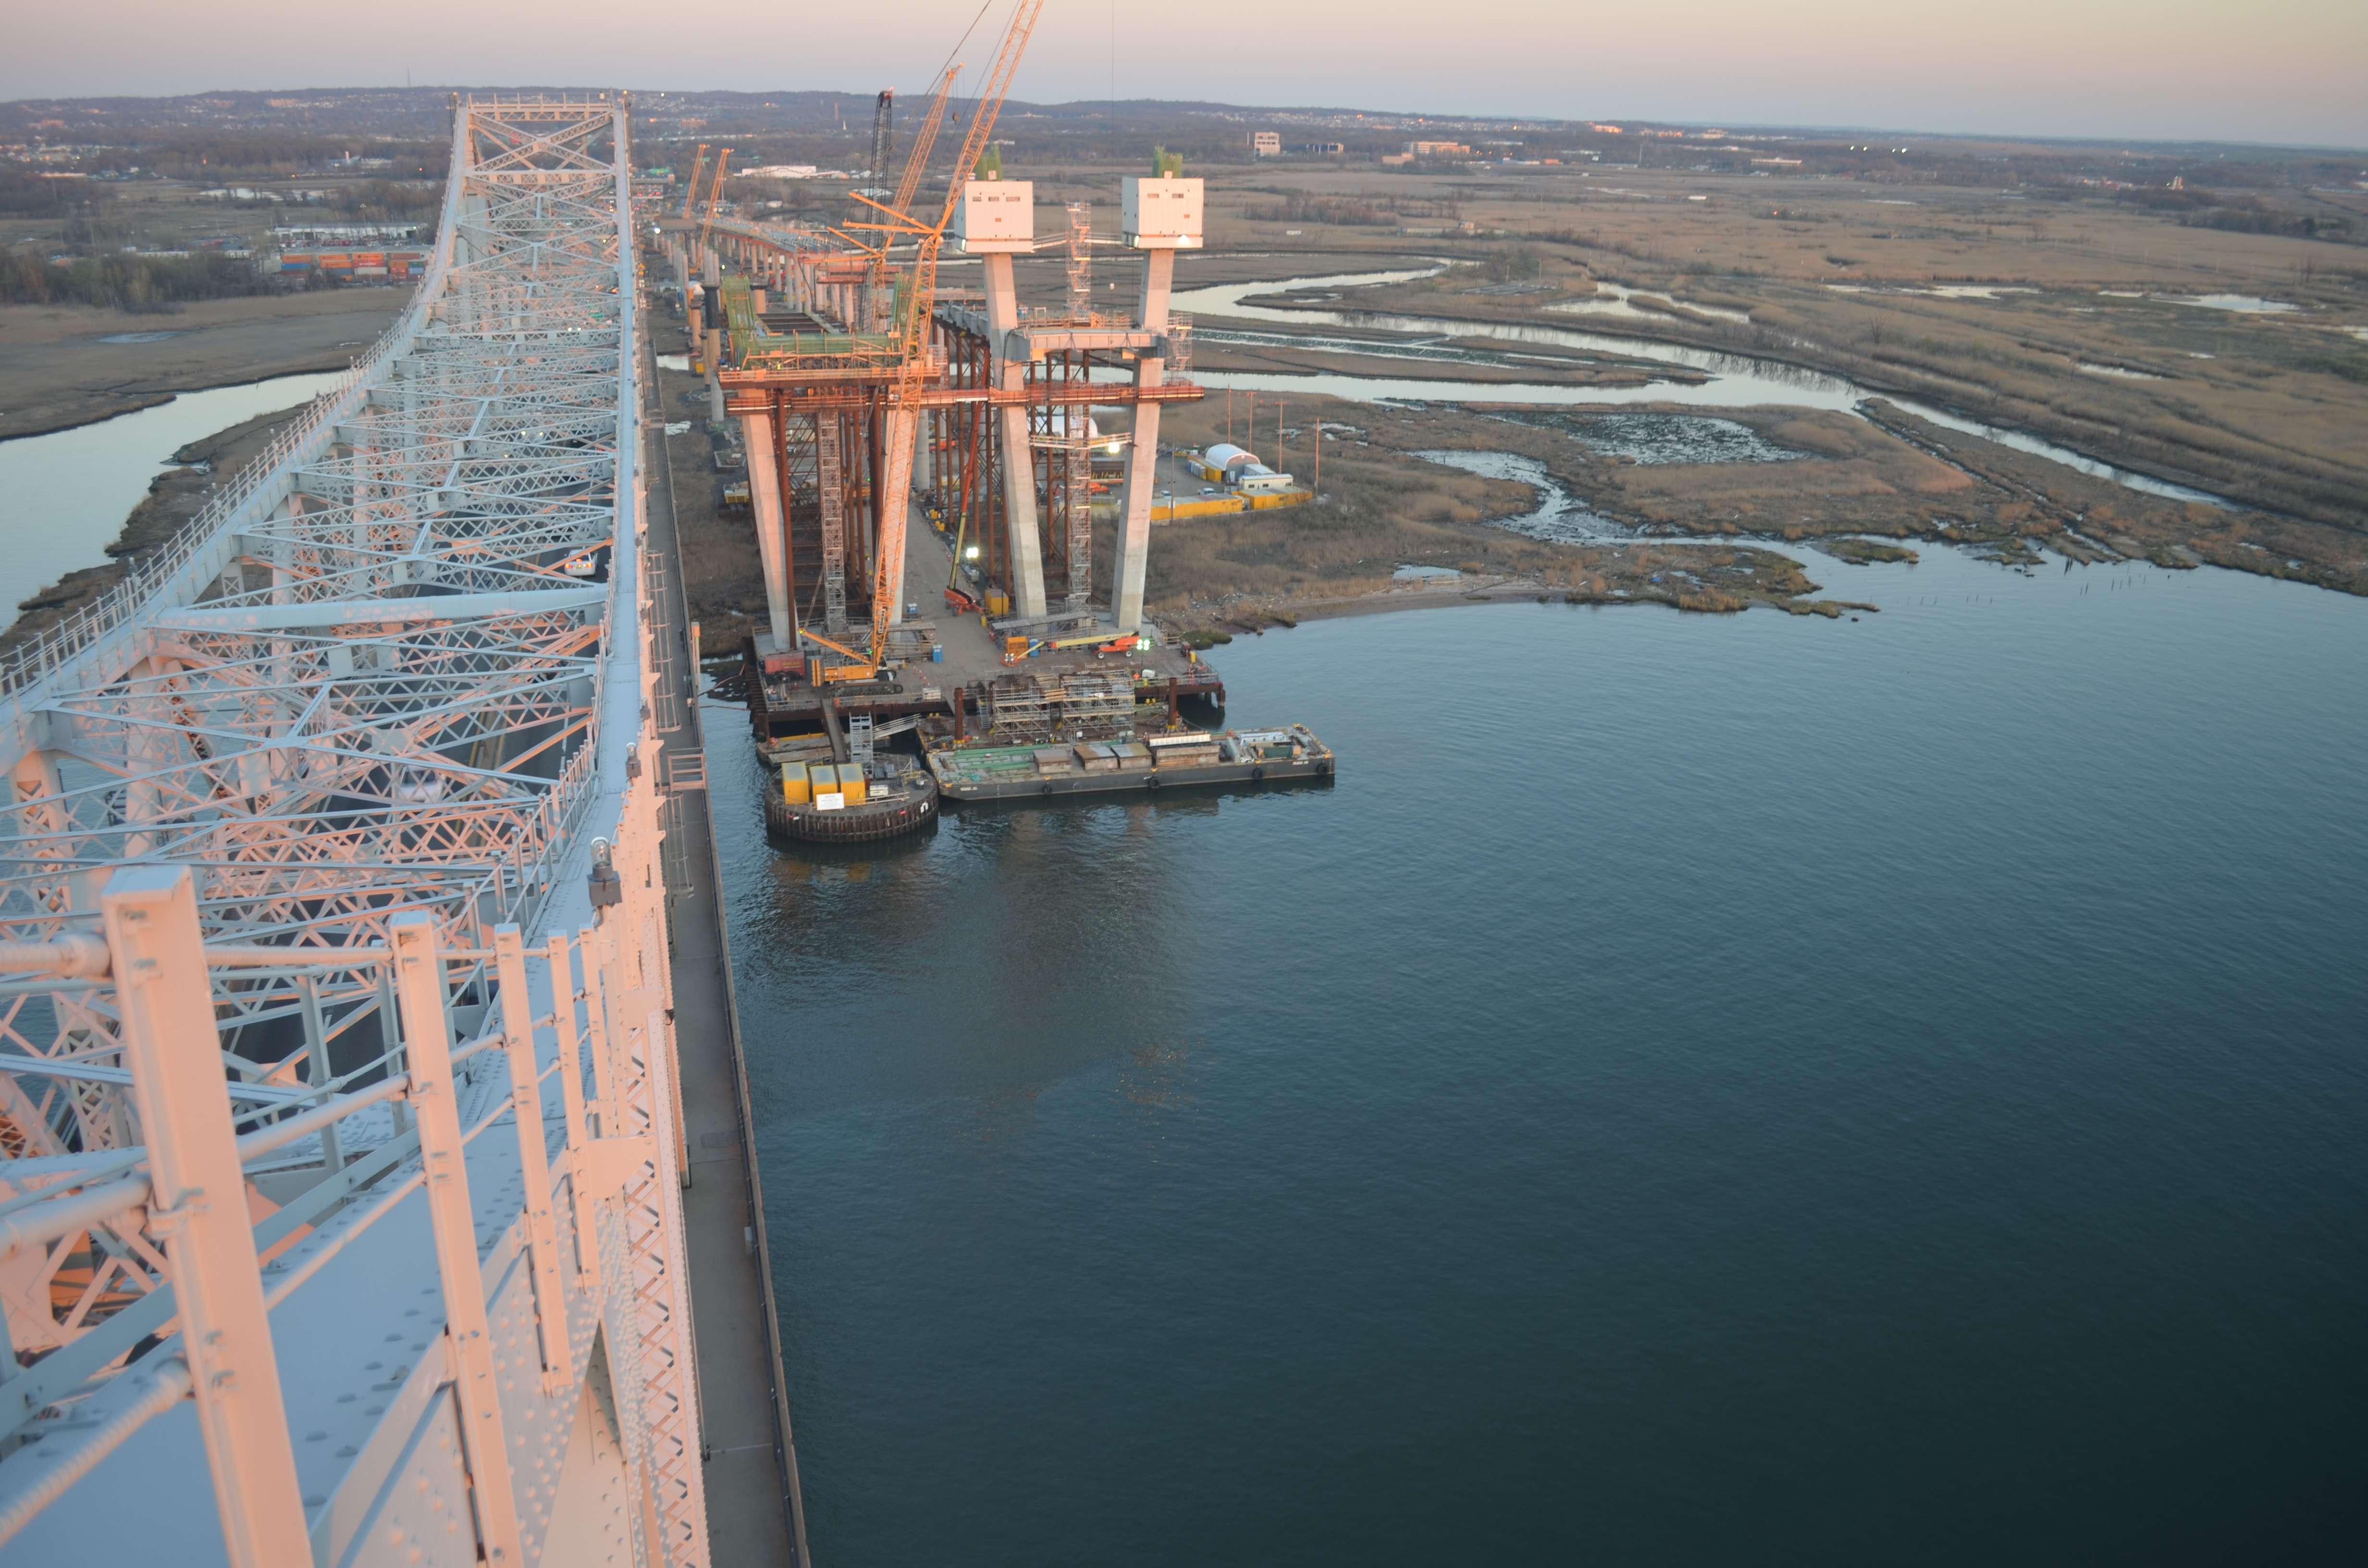 No. 5 - Goethals Bridge Replacement Project